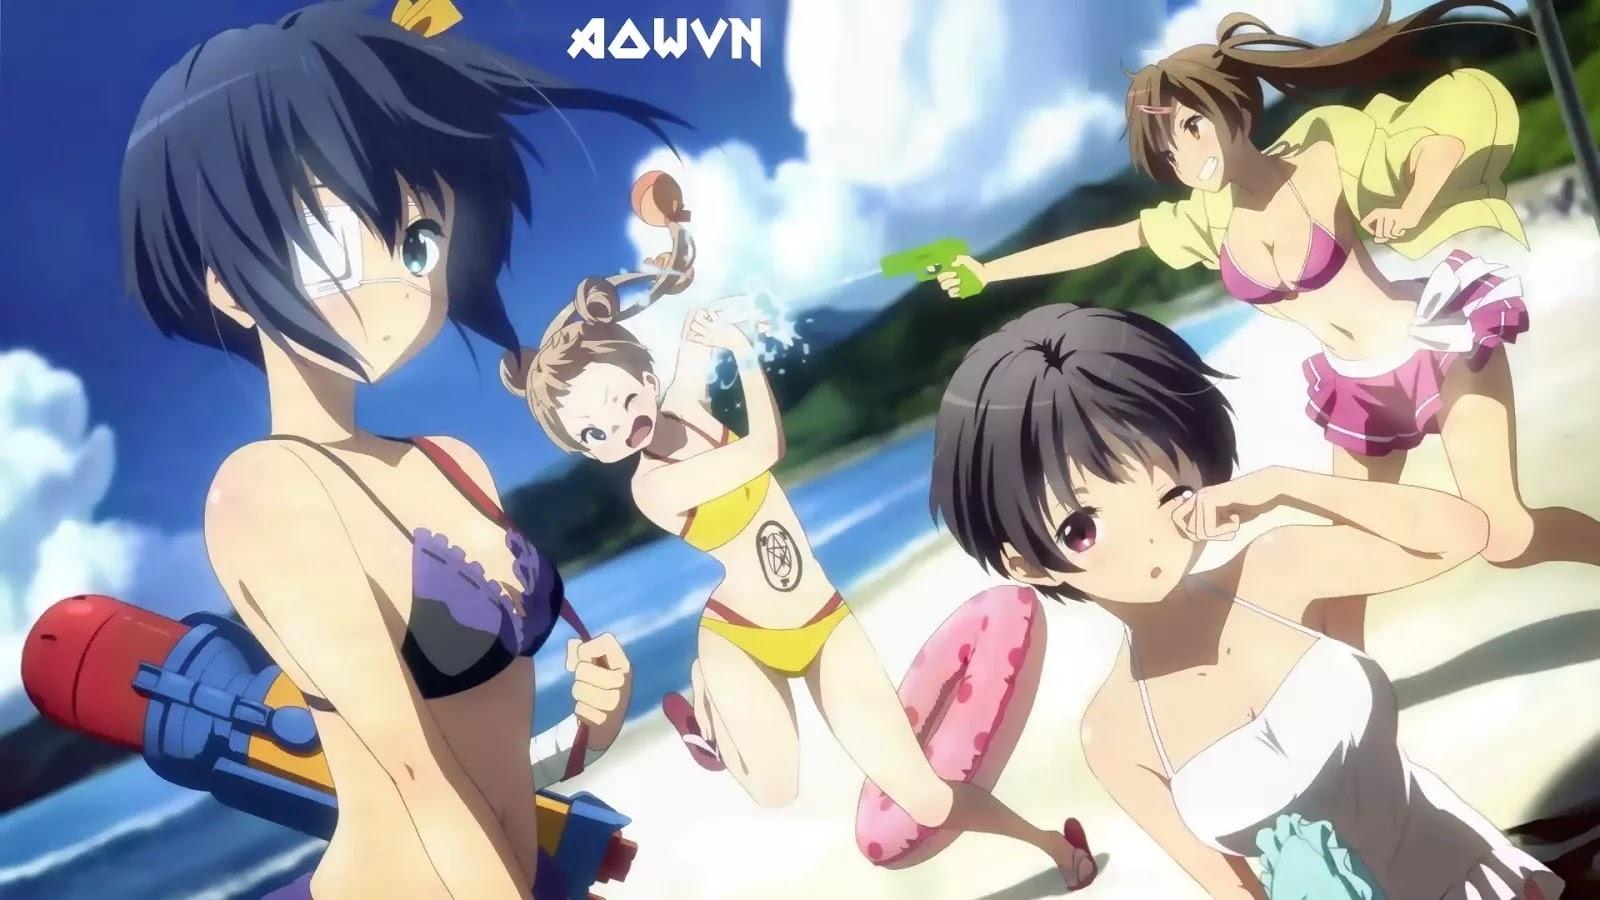 AowVN.org m%2B%25282%2529 - [ Anime 3gp Mp4 ] Chuunibyou demo Koi ga Shitai SS1 + SS2 + OVA + Special + Movie | Vietsub - Siêu Moe